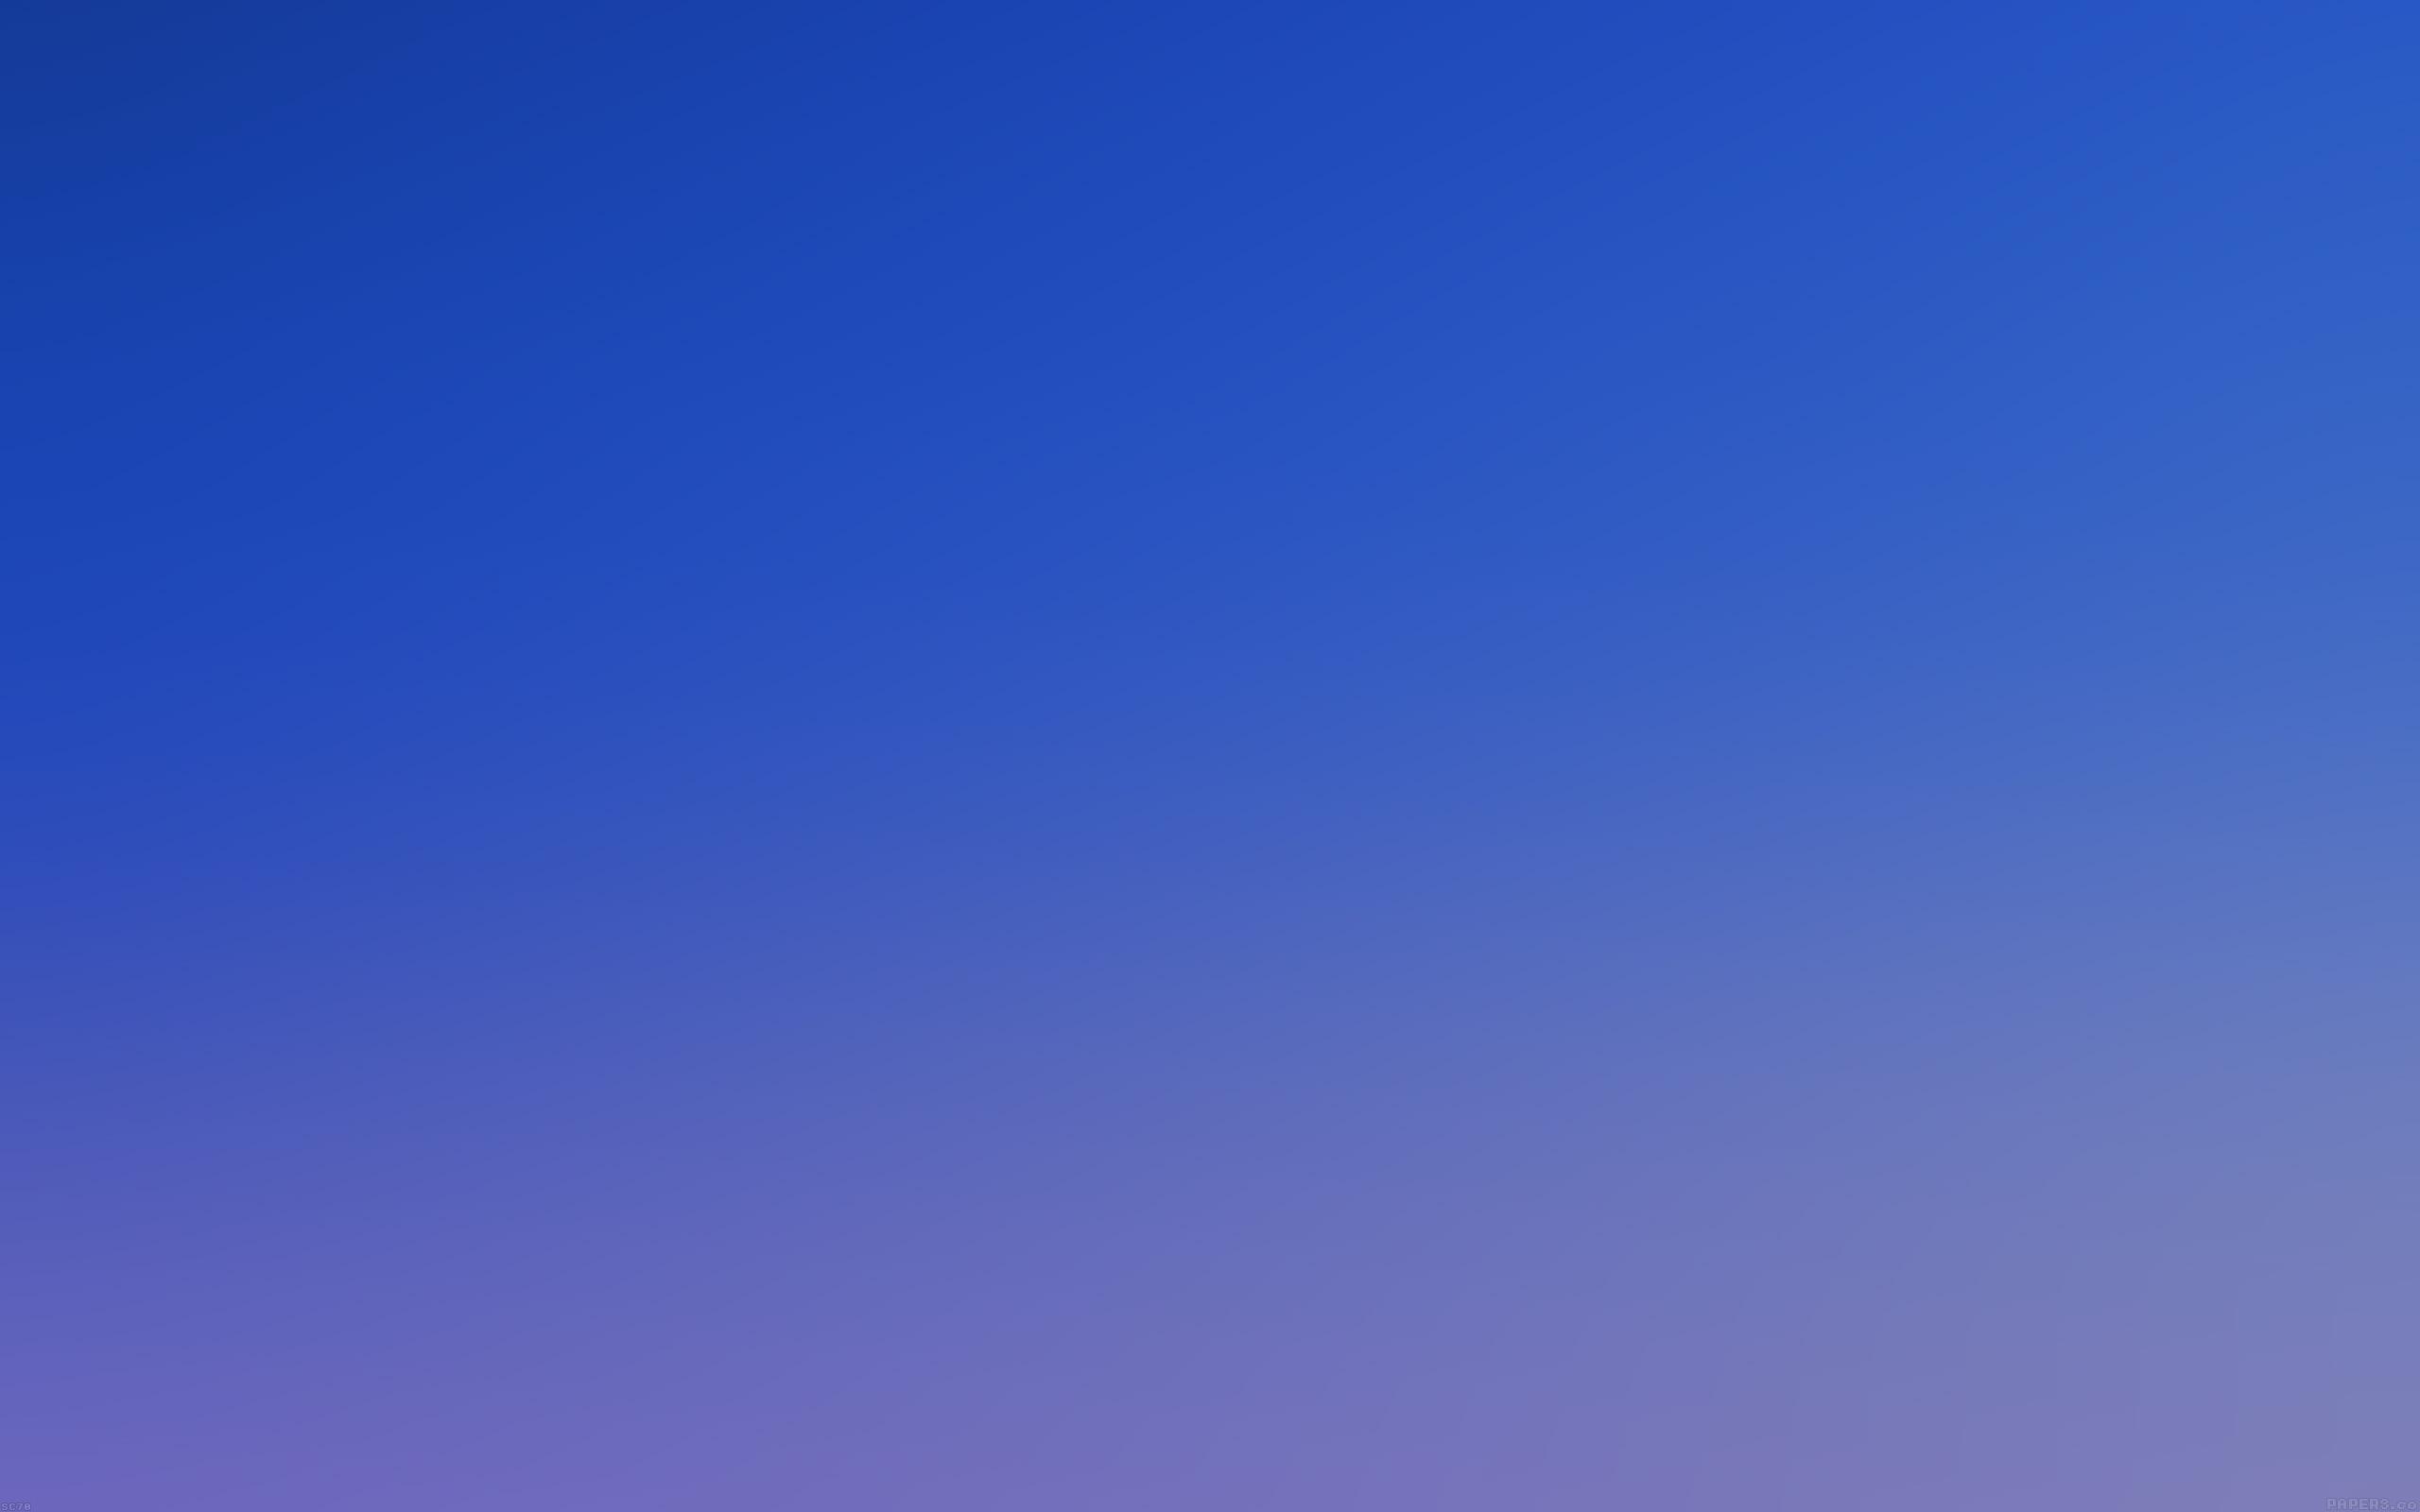 Sc86 Mackbook Pro Retina 4k Hd Blur Papersco